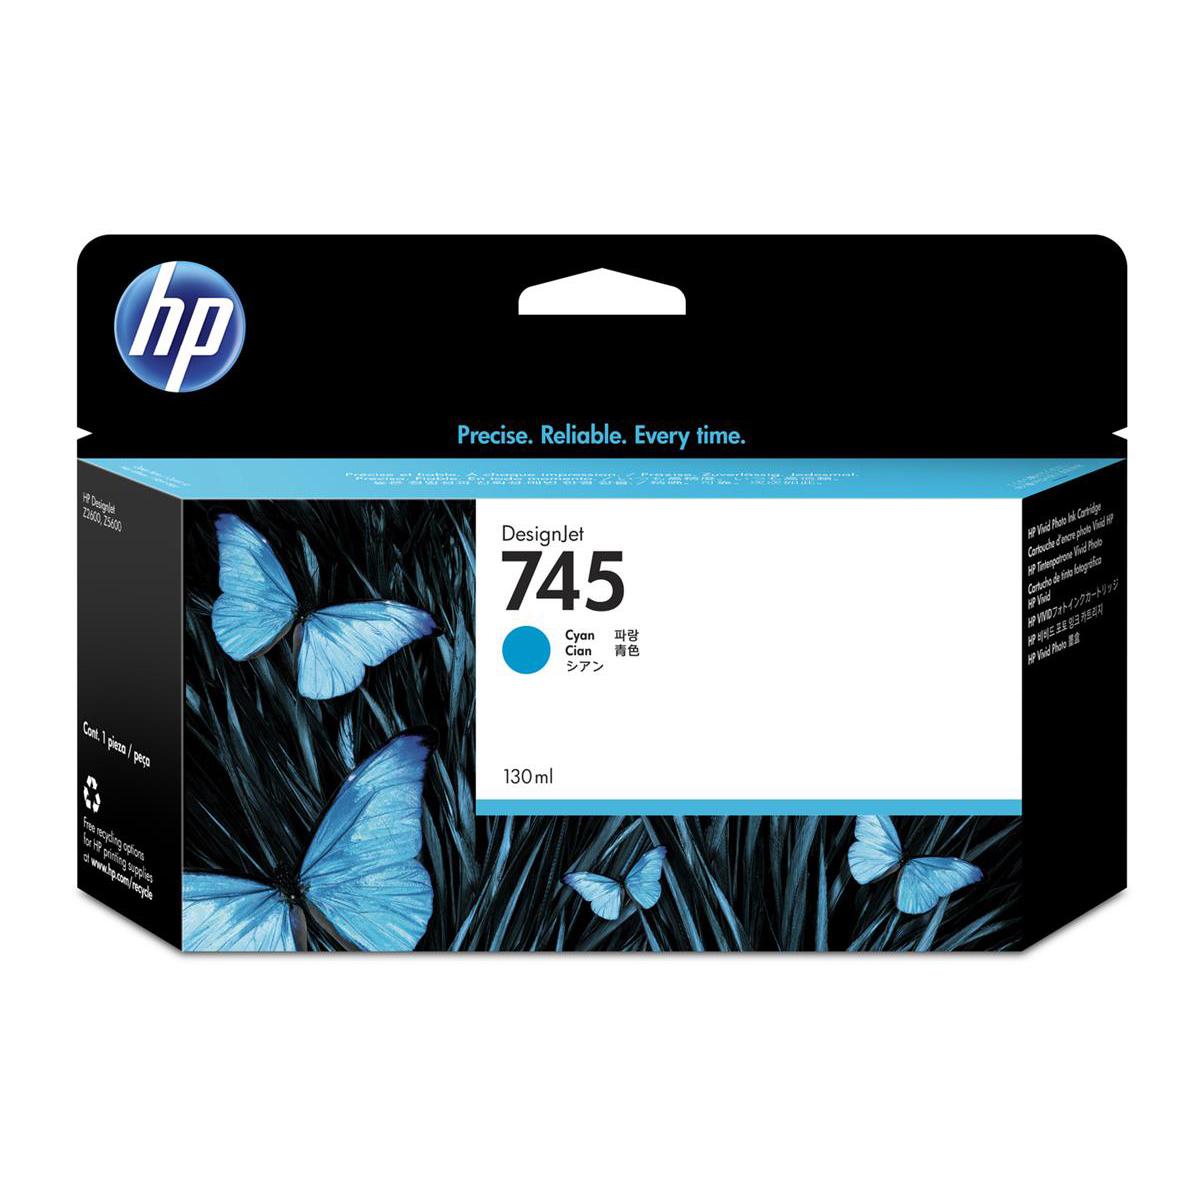 HP 745 130ml DesignJet Cyan Ink Cartridge F9J97A *3 to 5 Day Leadtime*